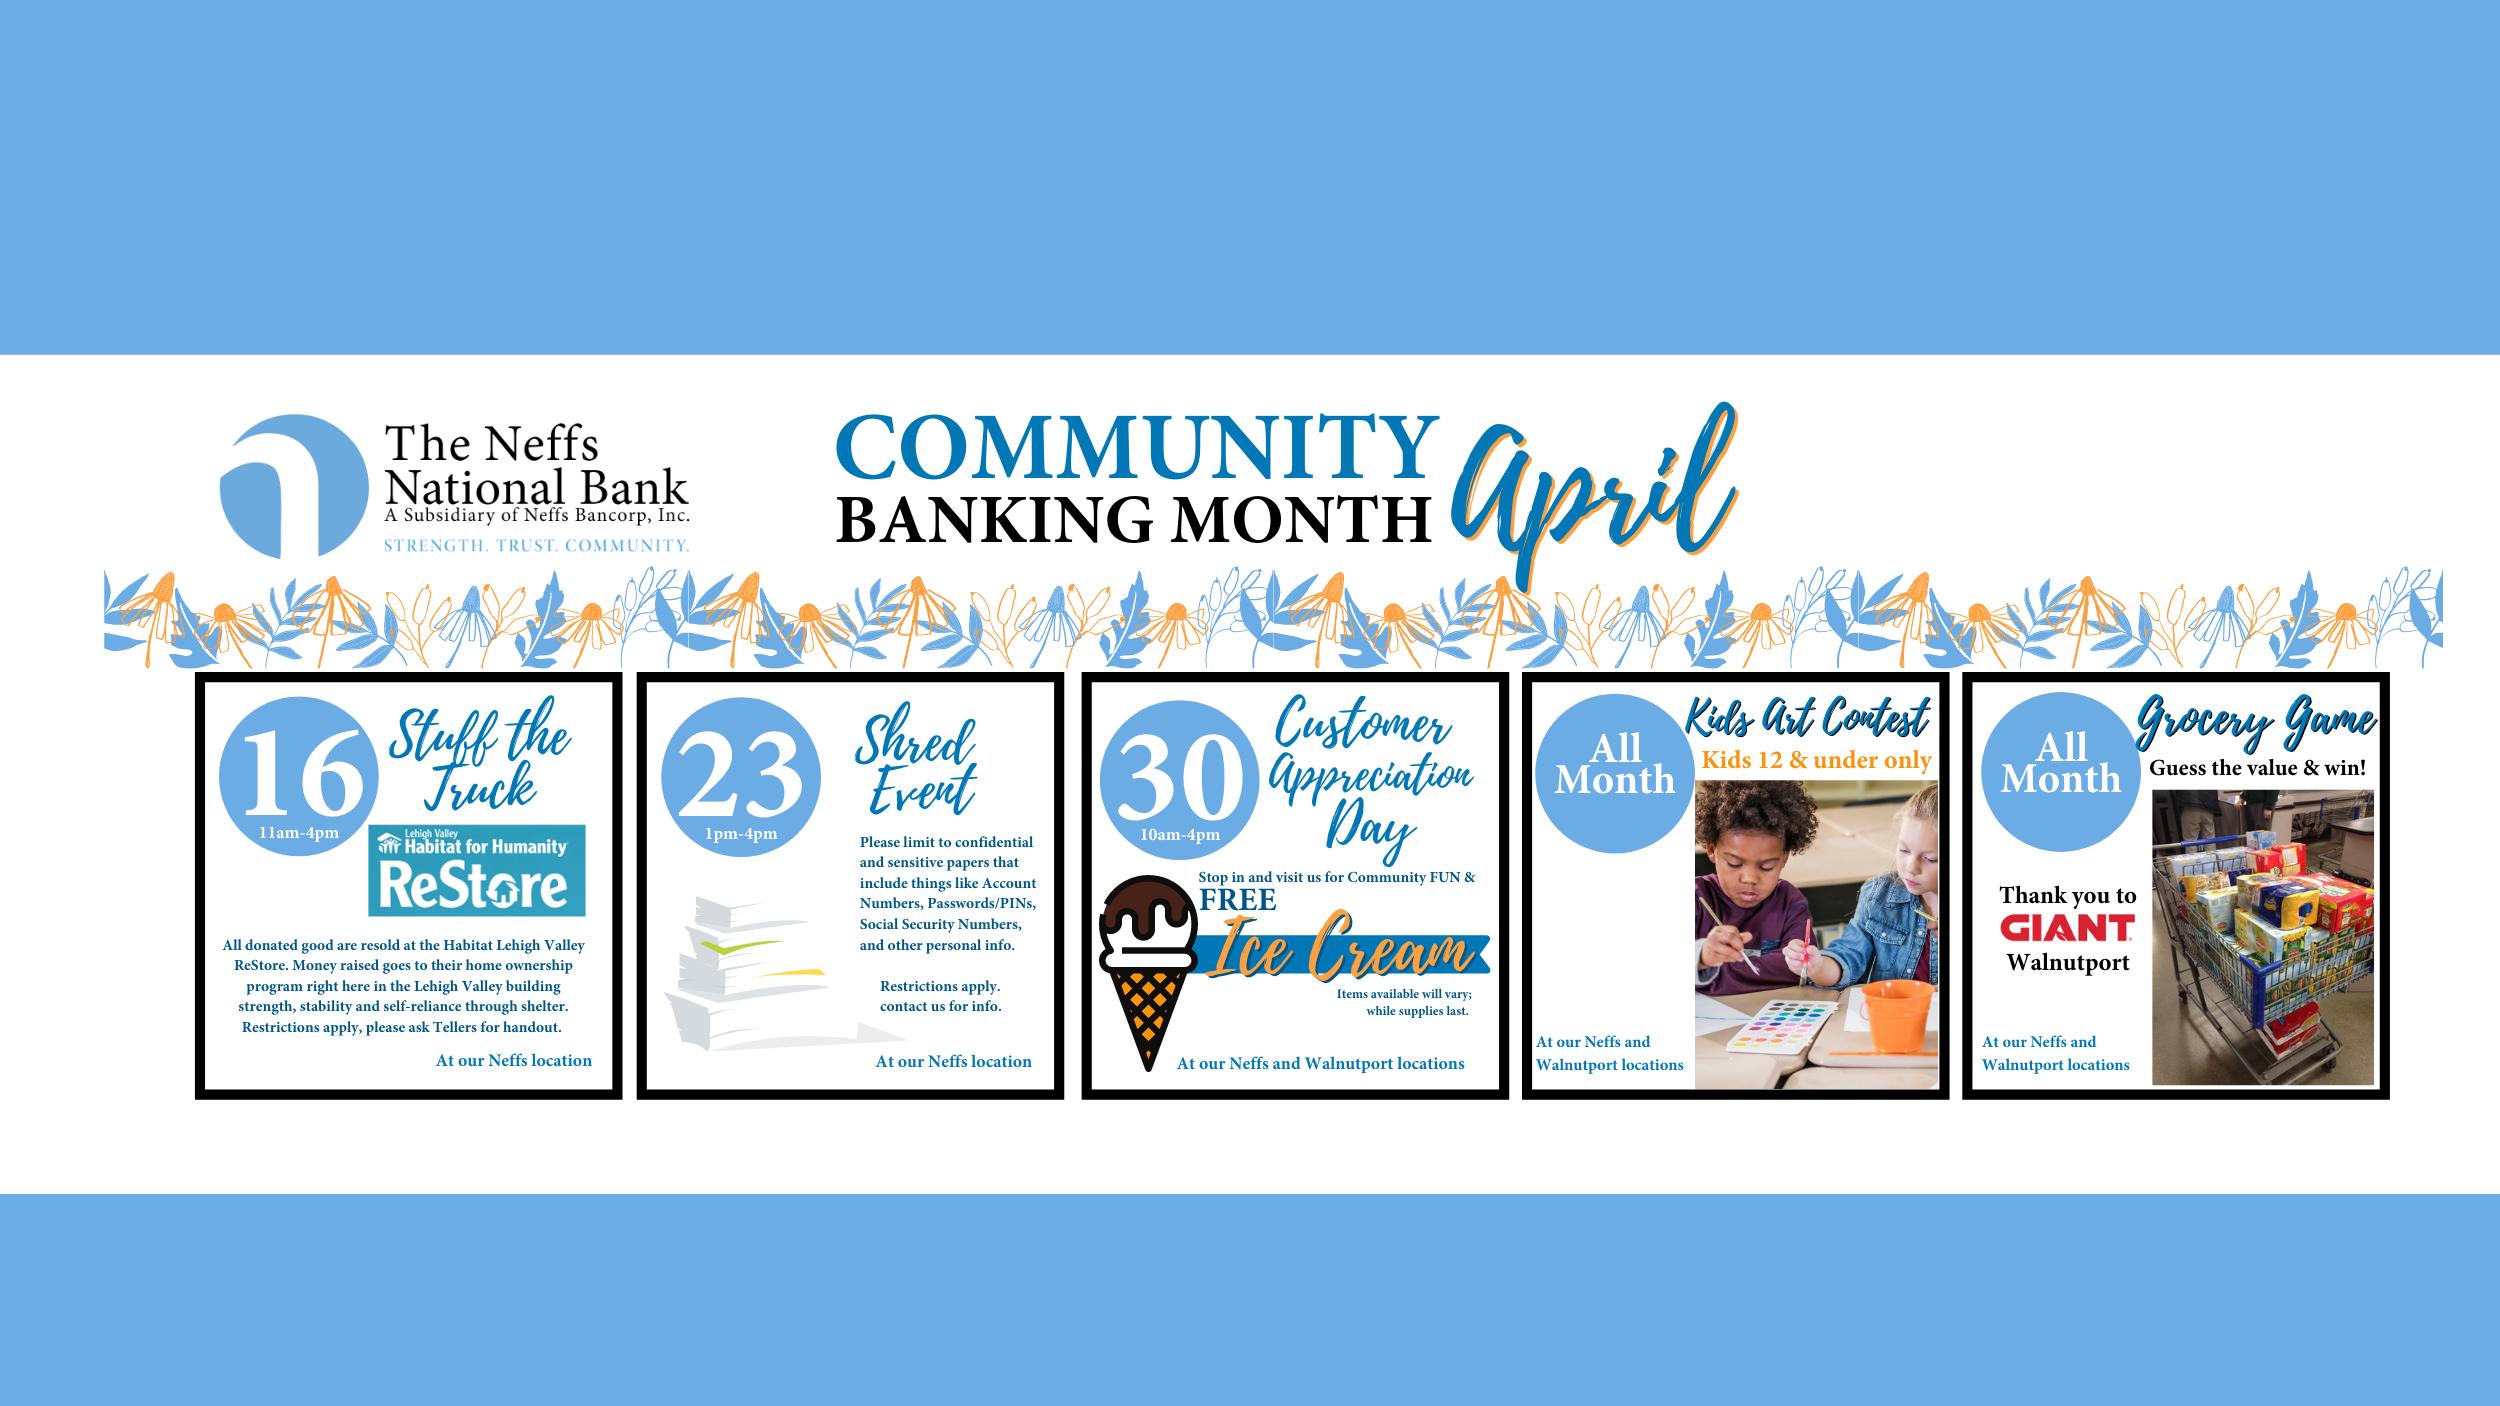 Community banking Day